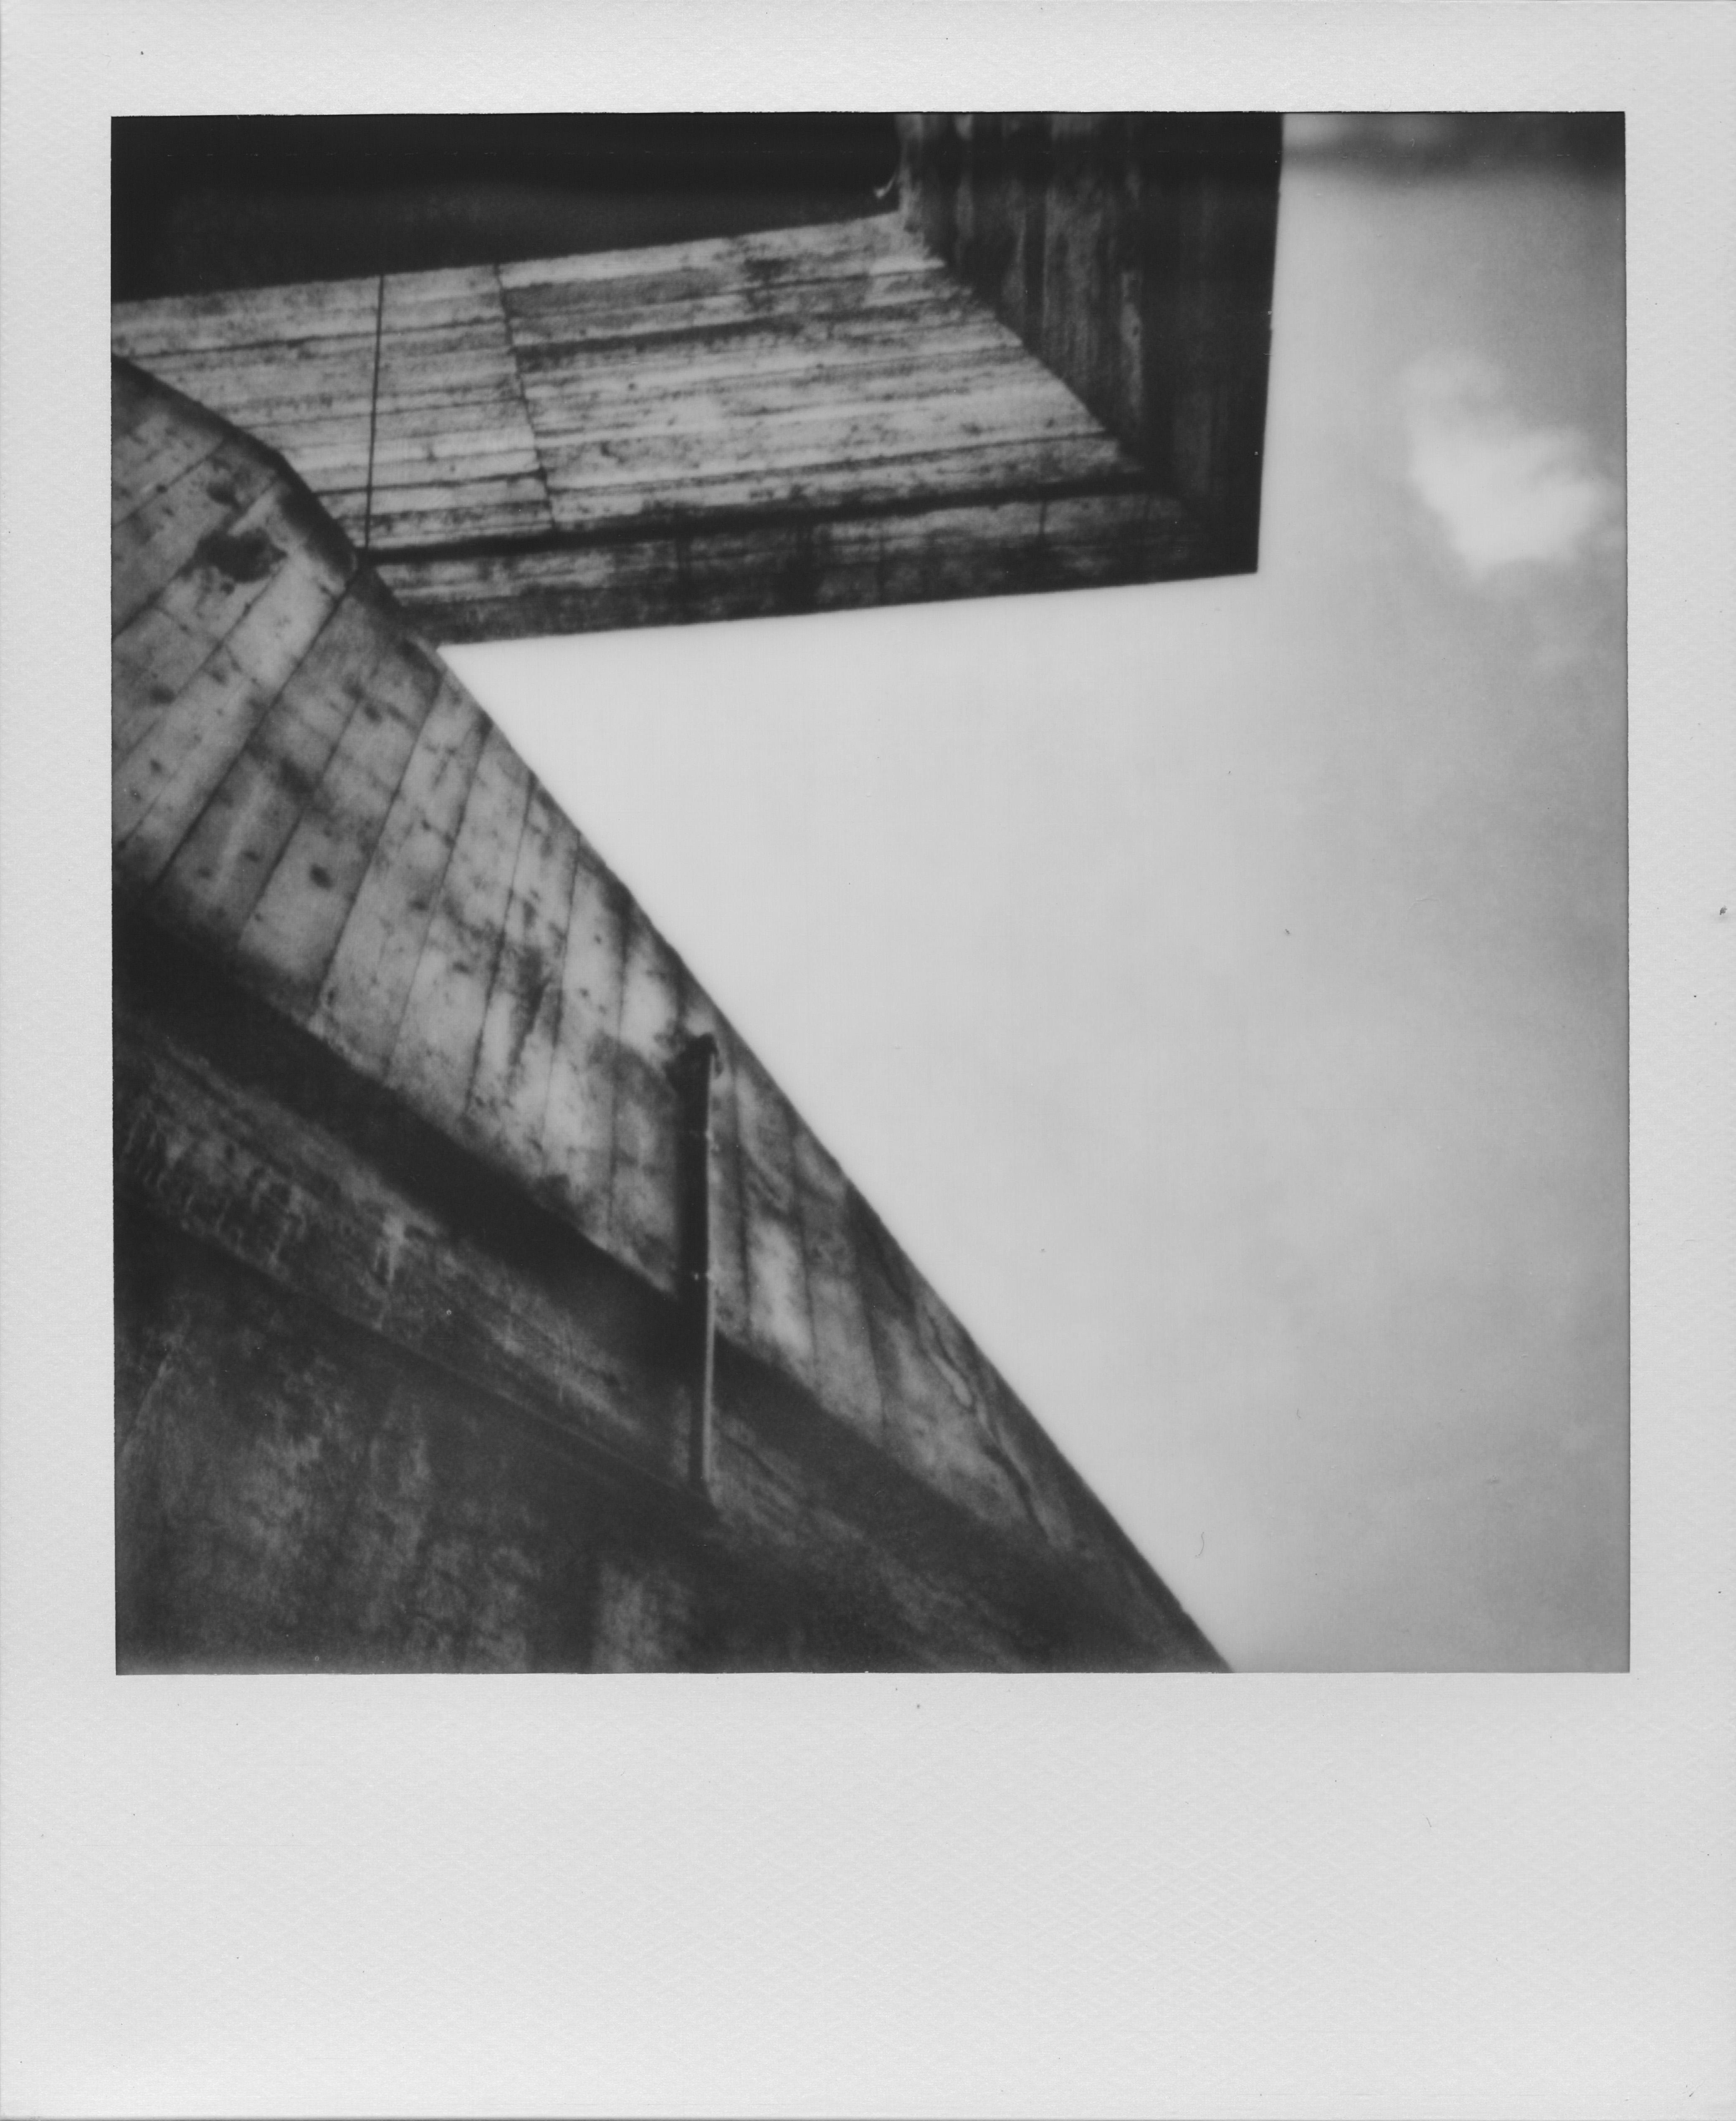 silenzi strutturali